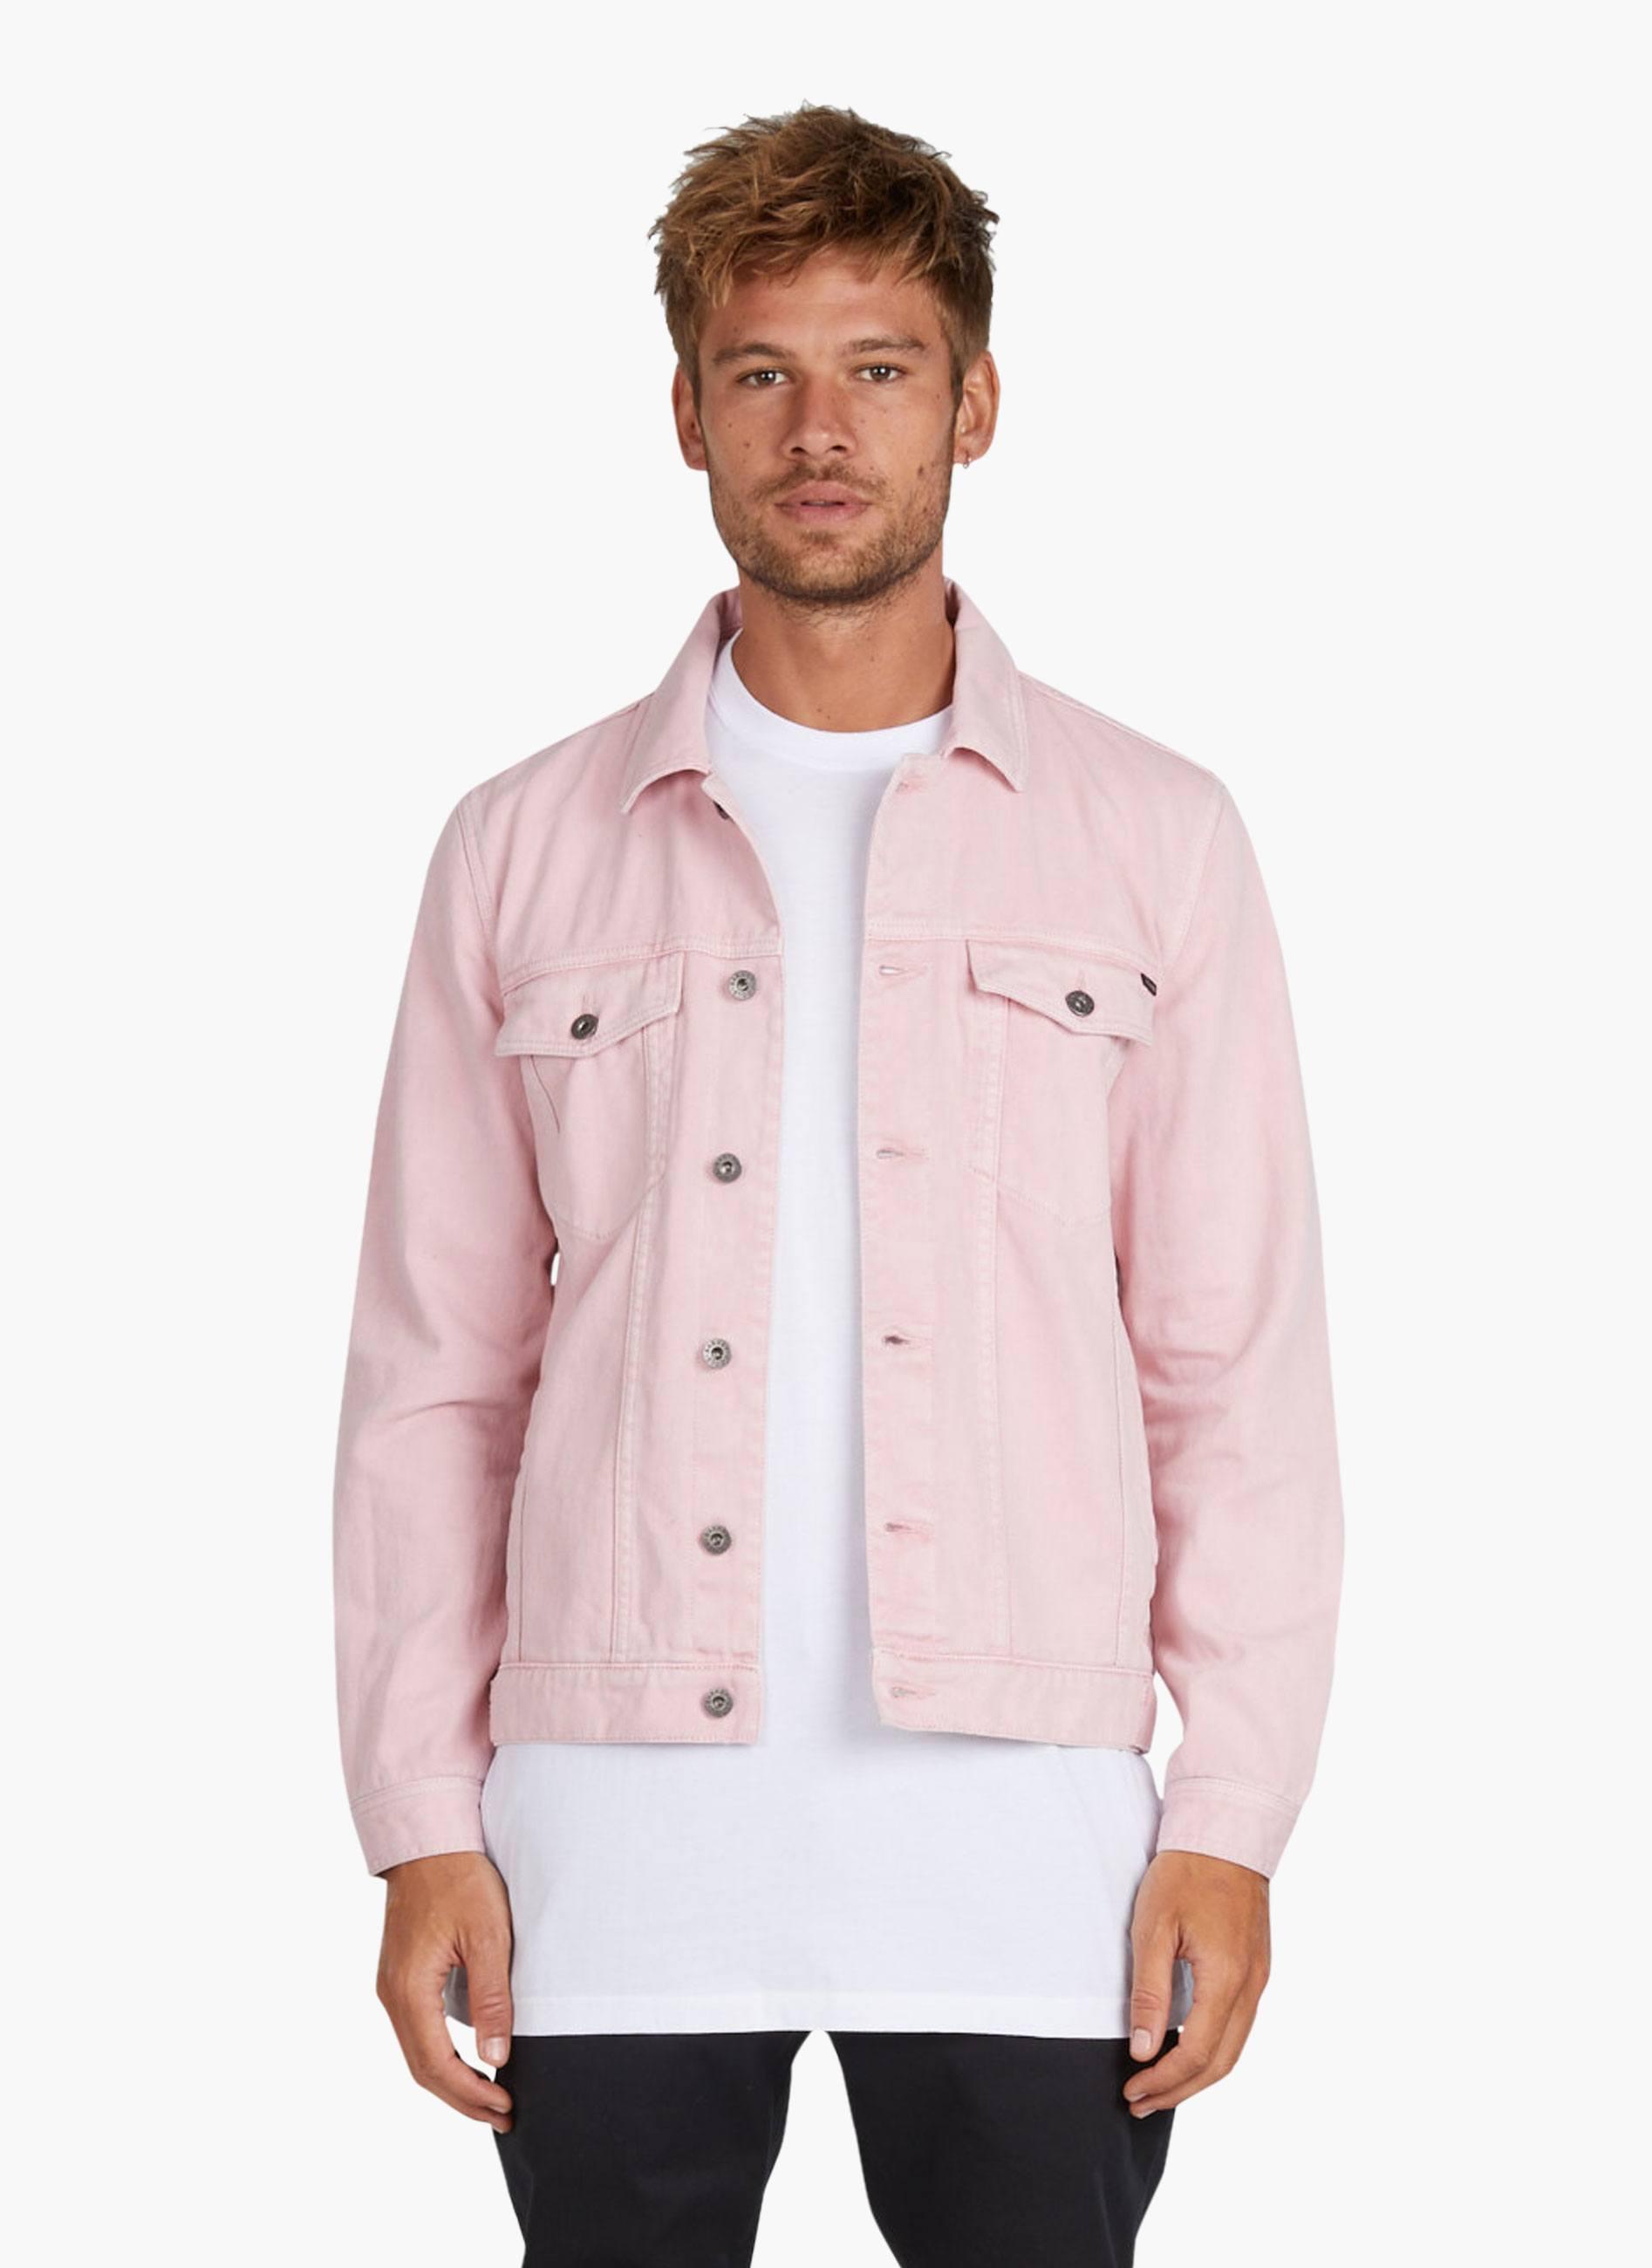 BARNEY-COOLS-B.Rigid-Jacket-Pink-01.jpg